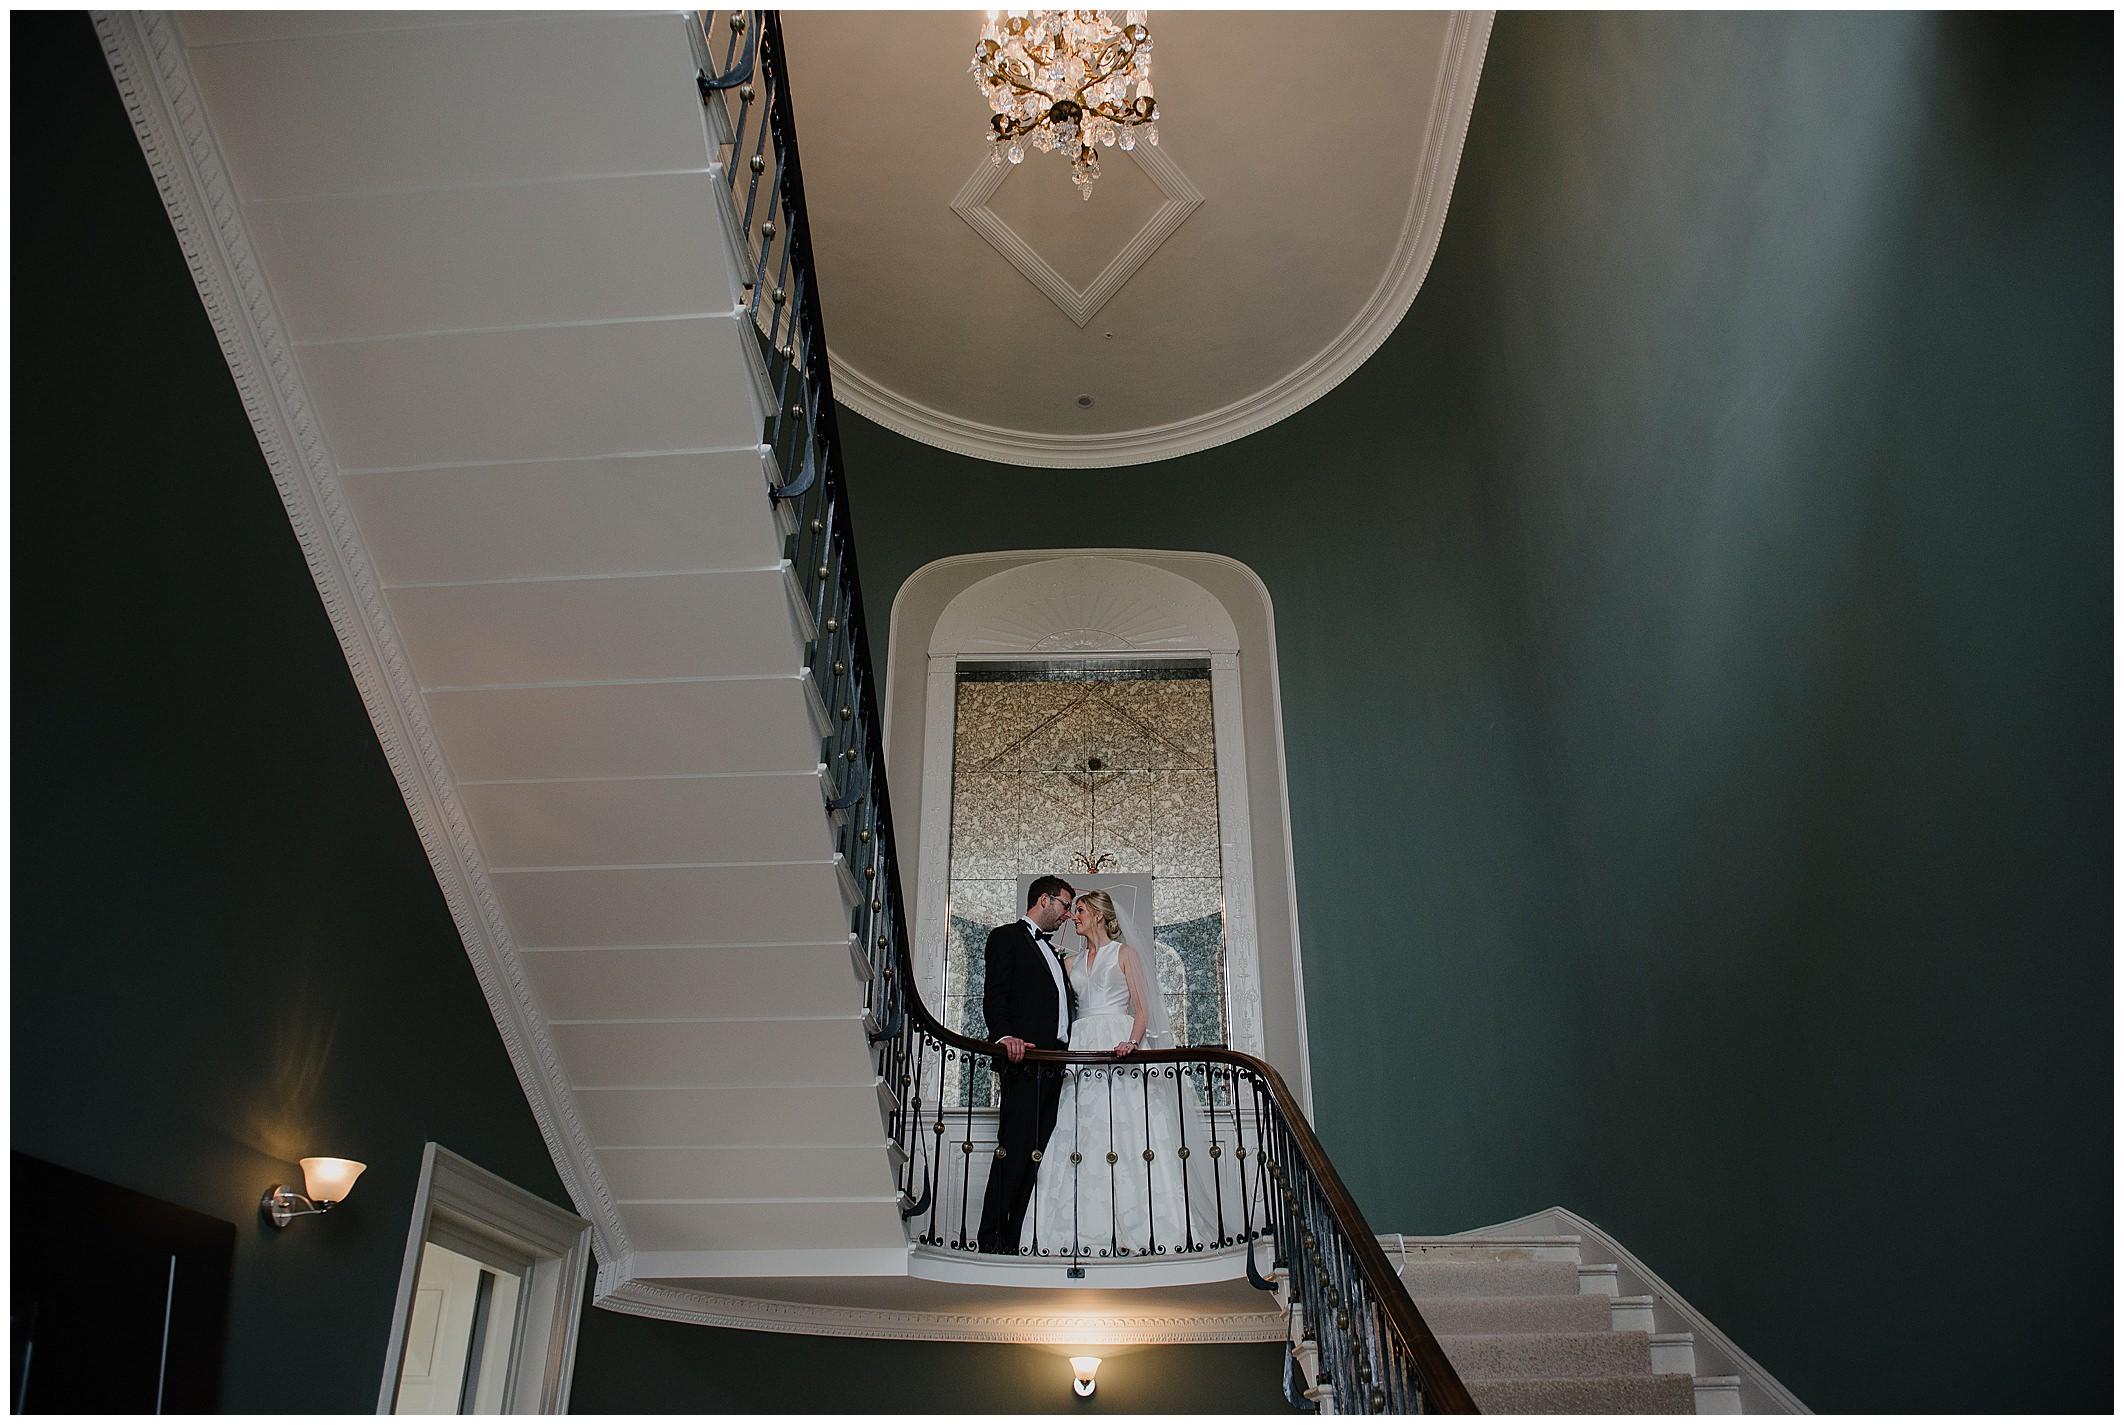 farnham-estate-wedding-jude-browne-photography_0145.jpg